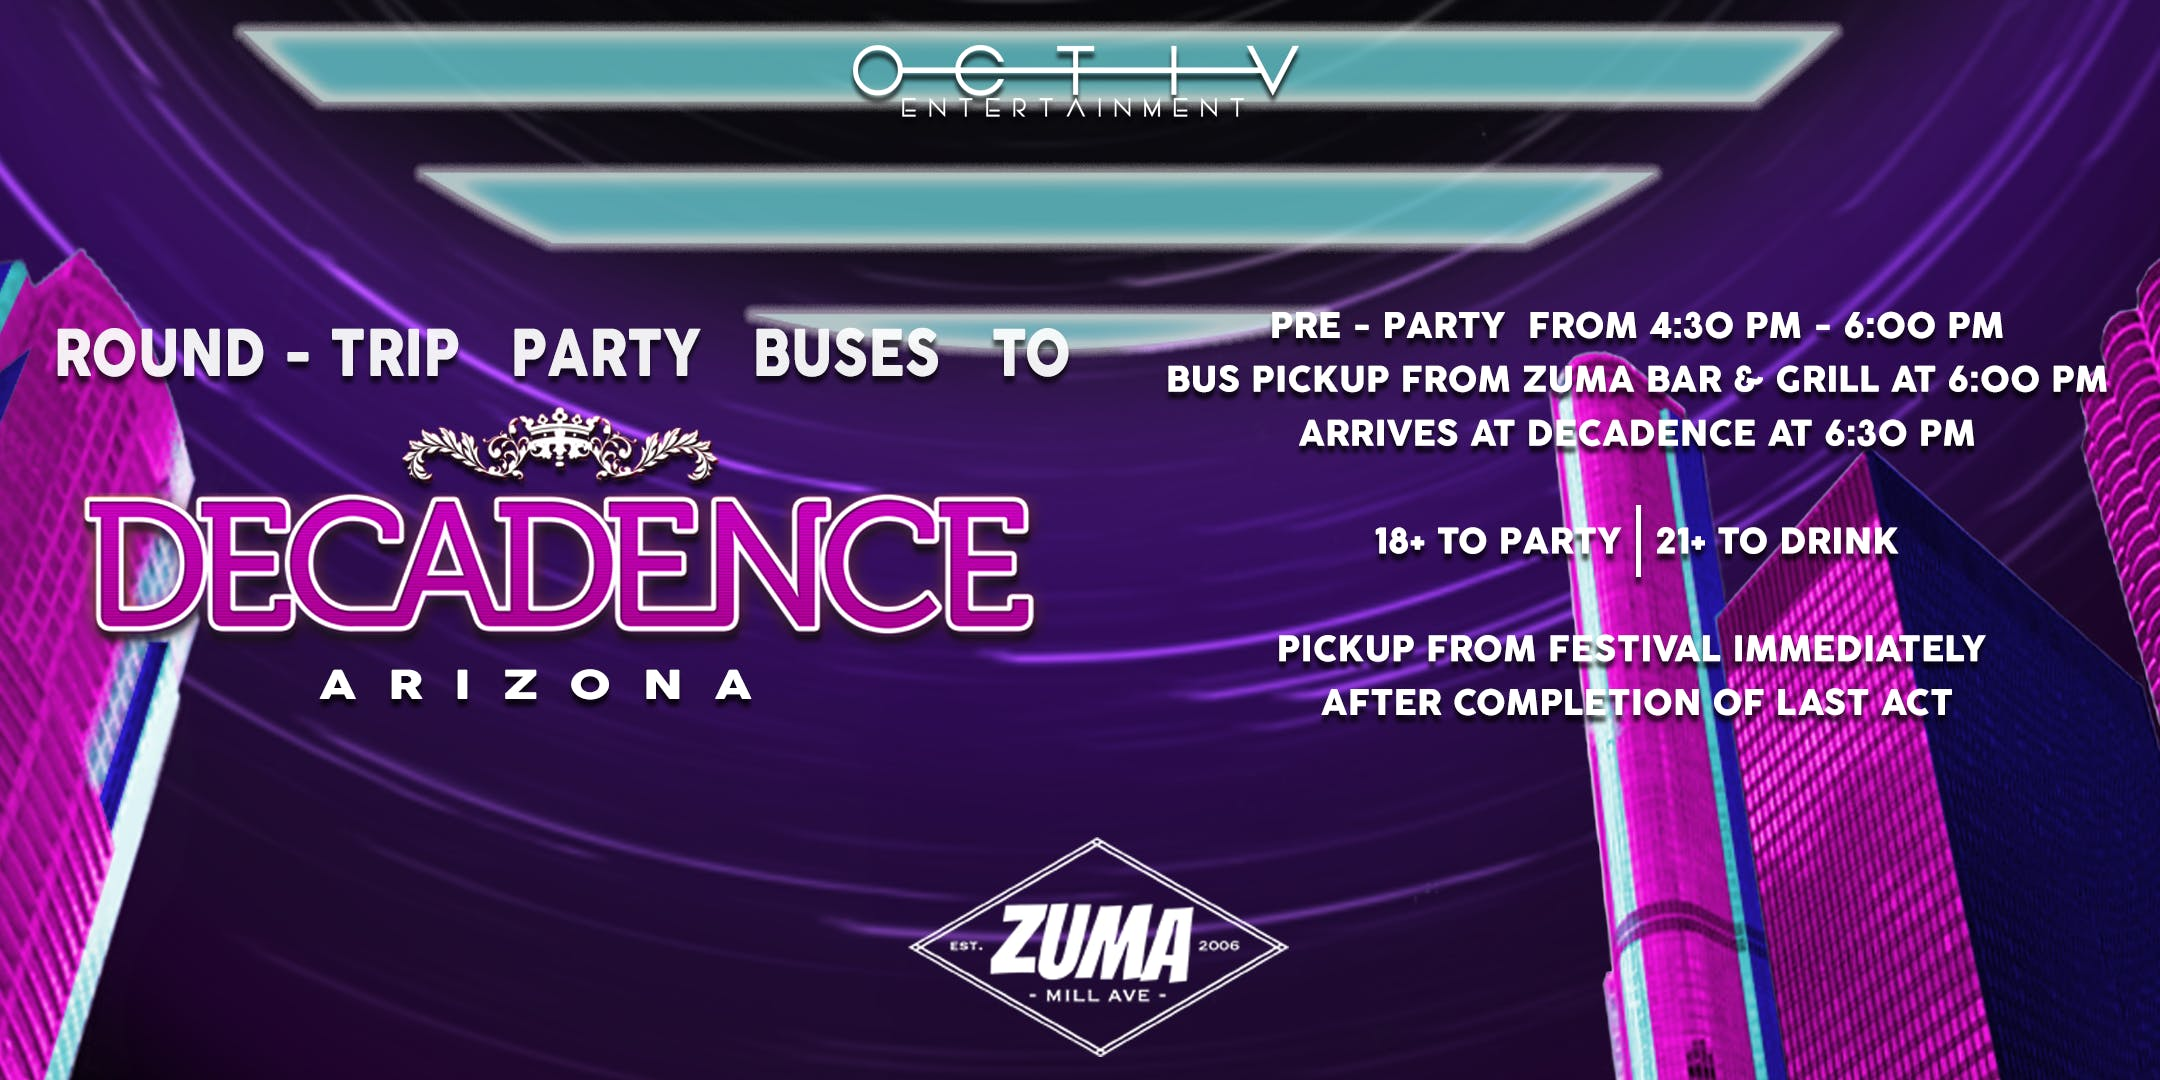 Decadence Arizona 2018 - Party Buses OCTIV